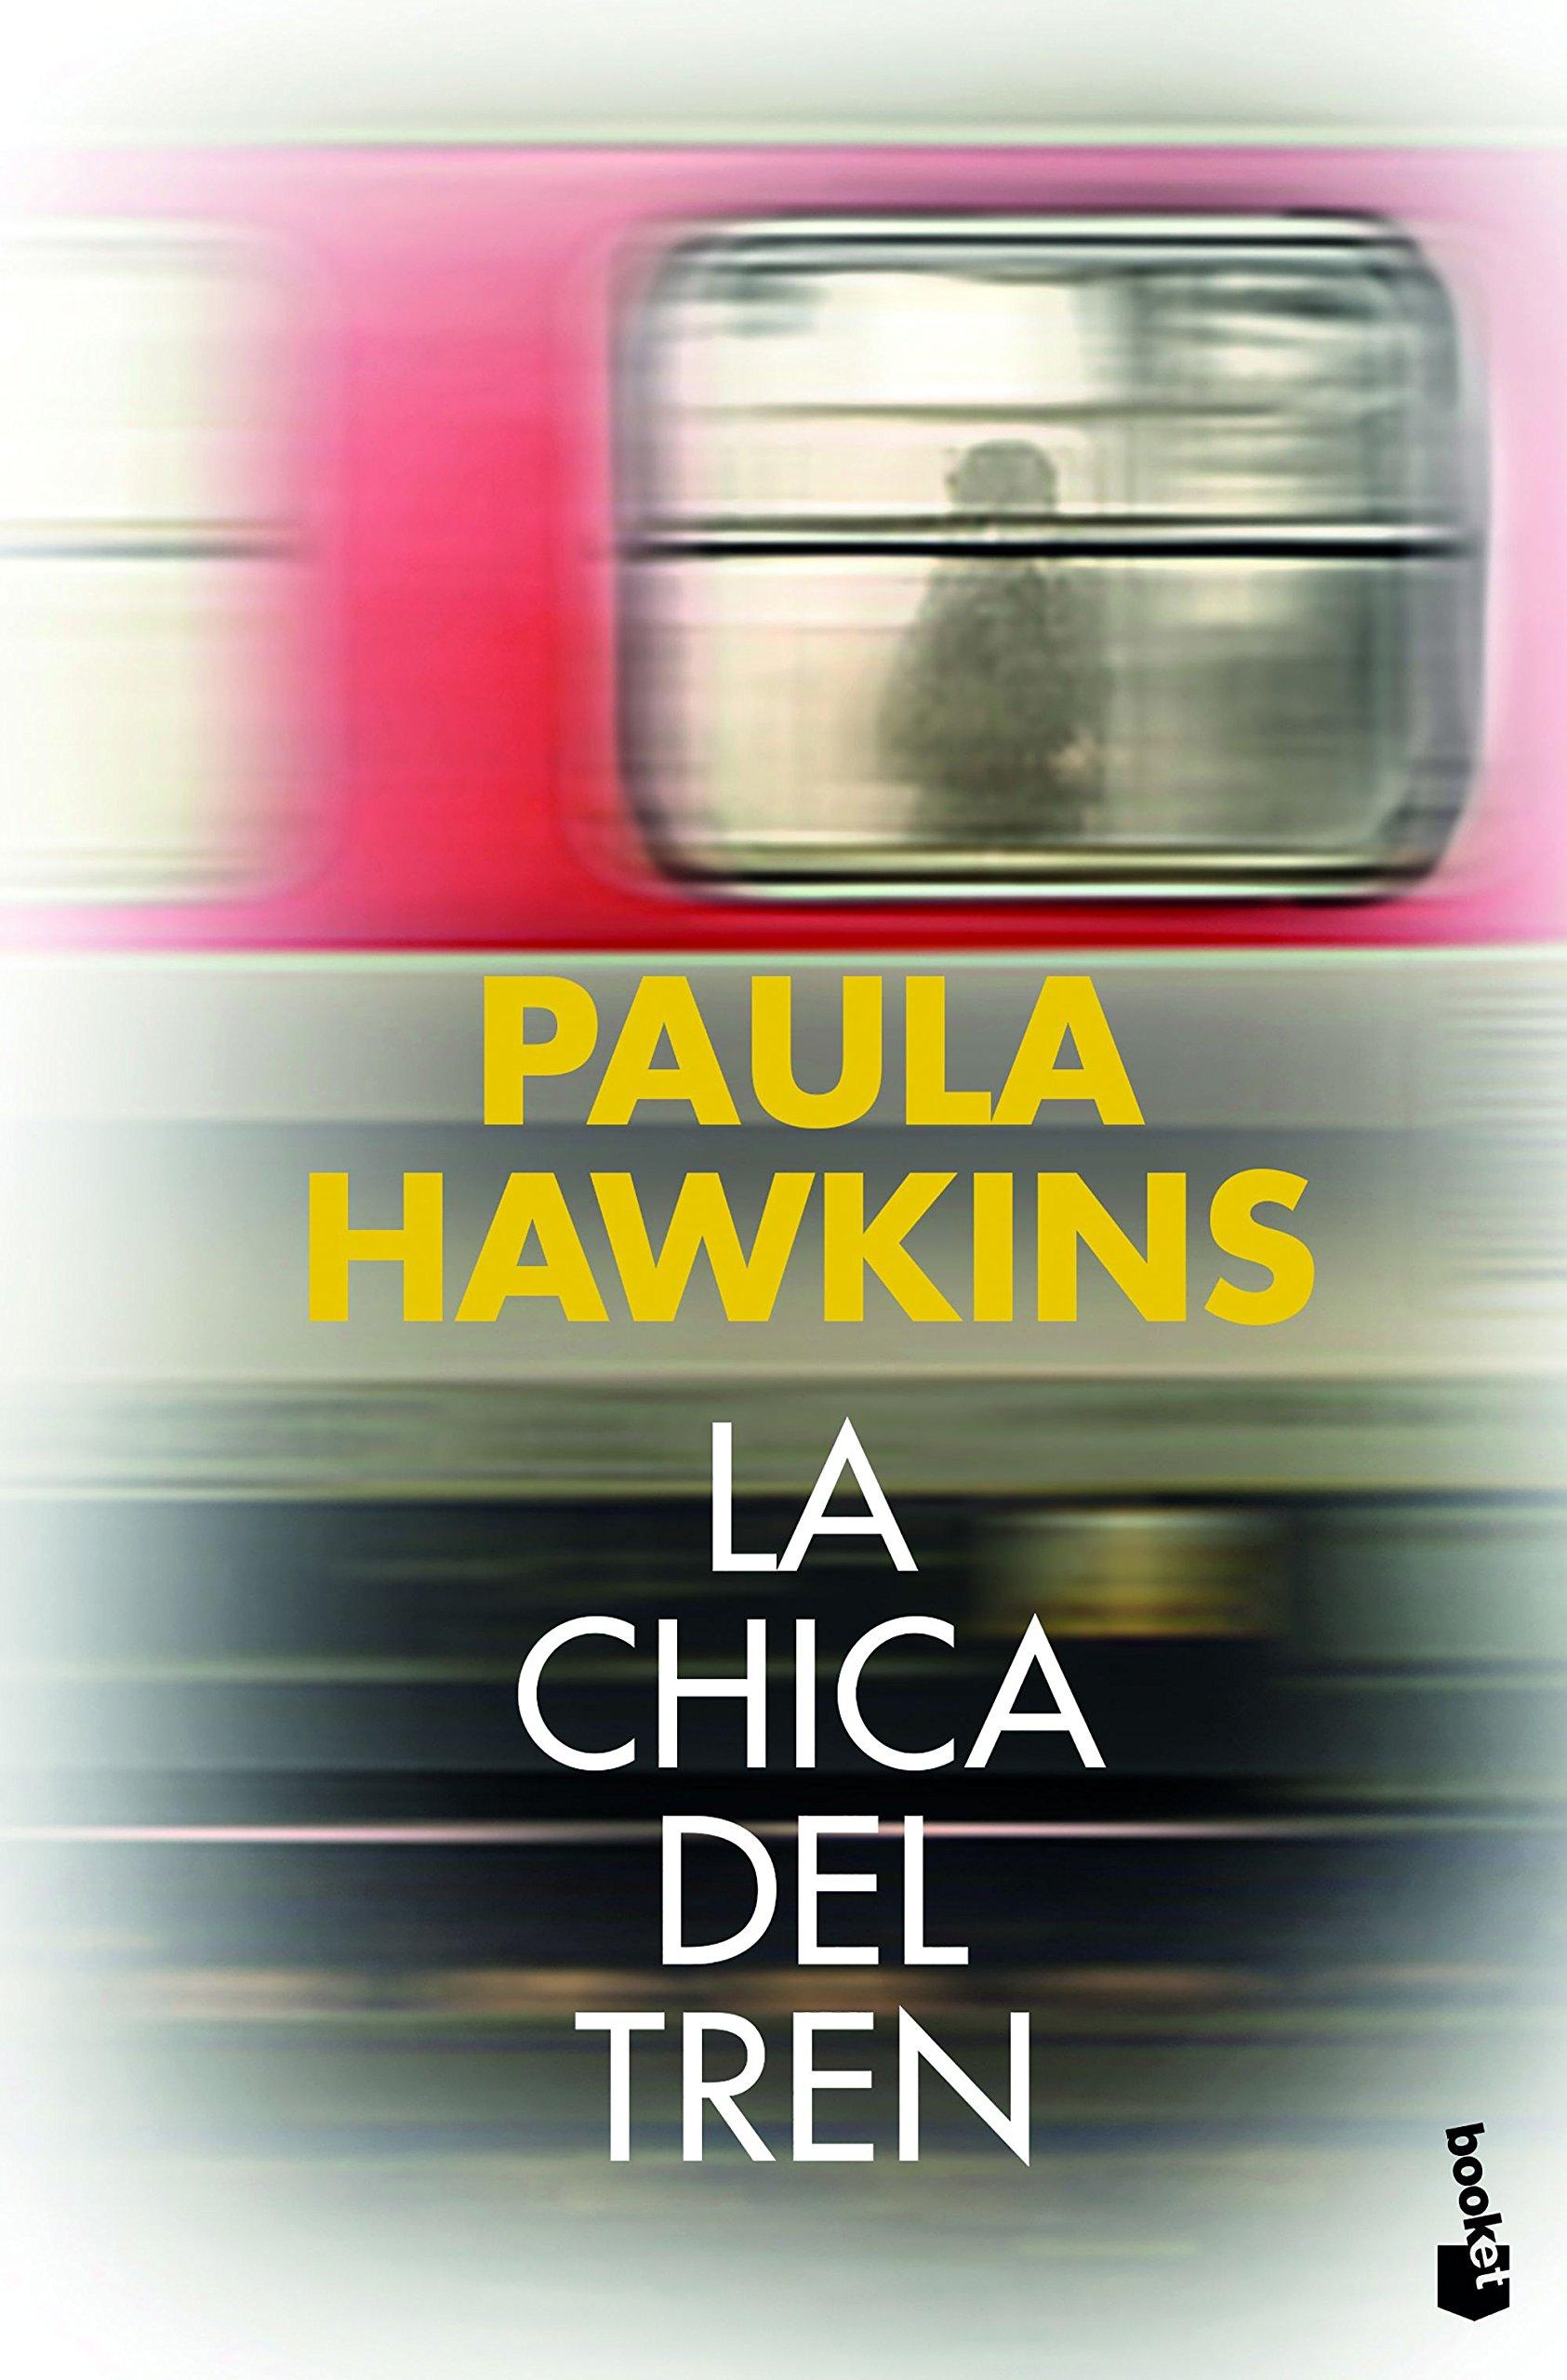 La chica del tren - Paula Hawkins